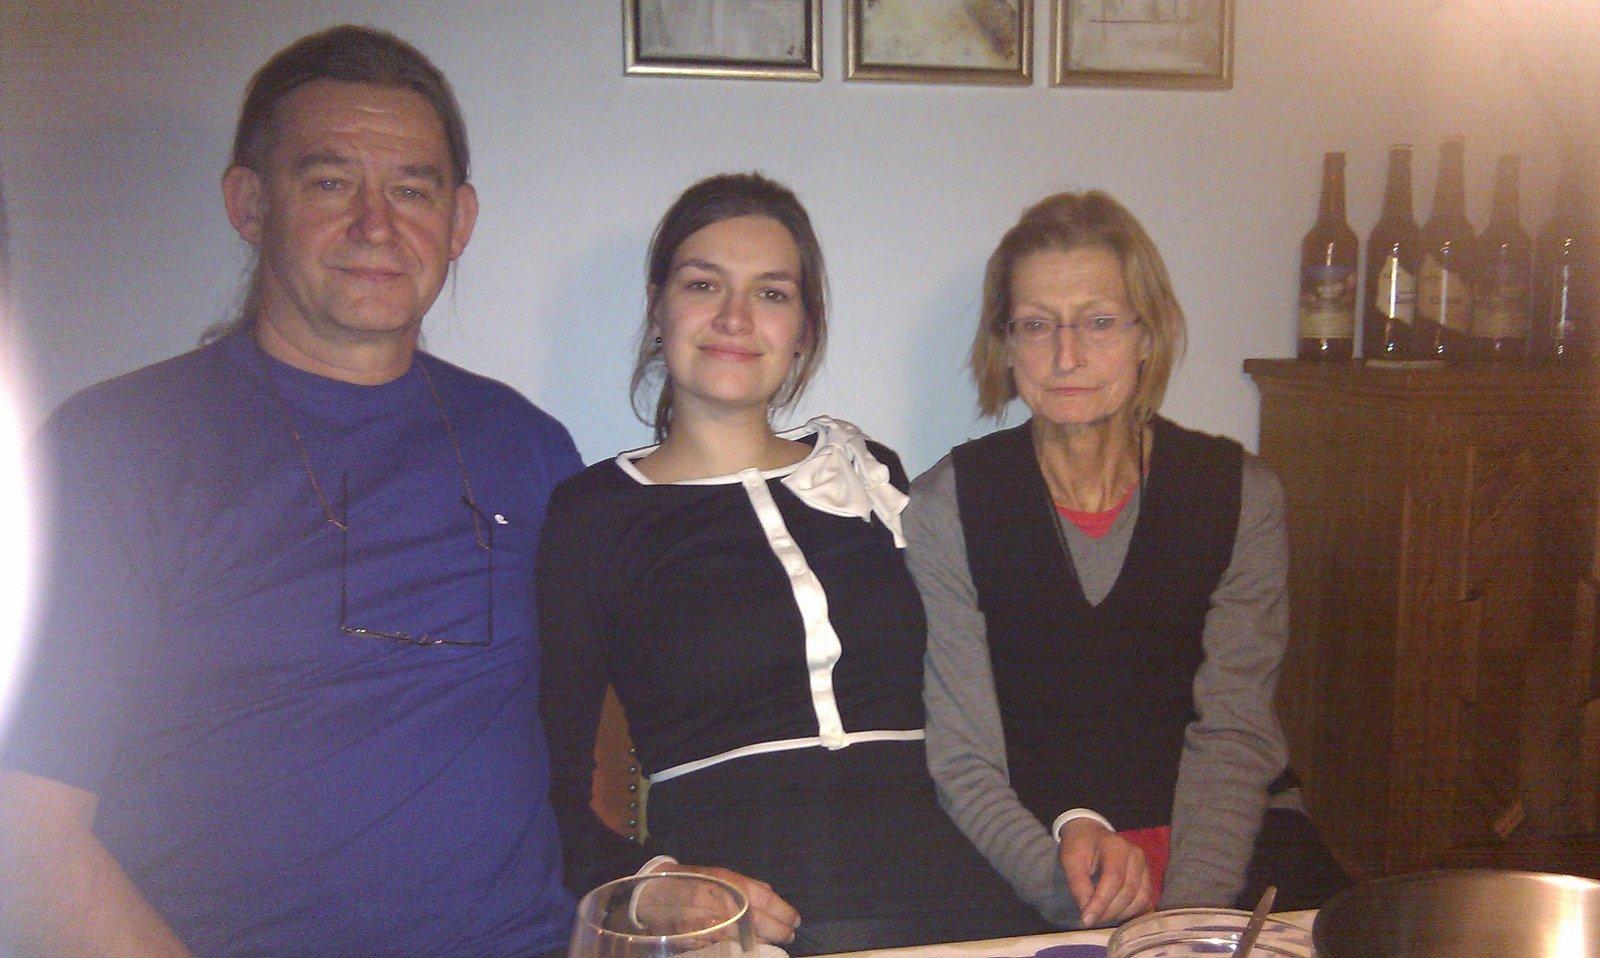 Min onkel, mig selv og min mor